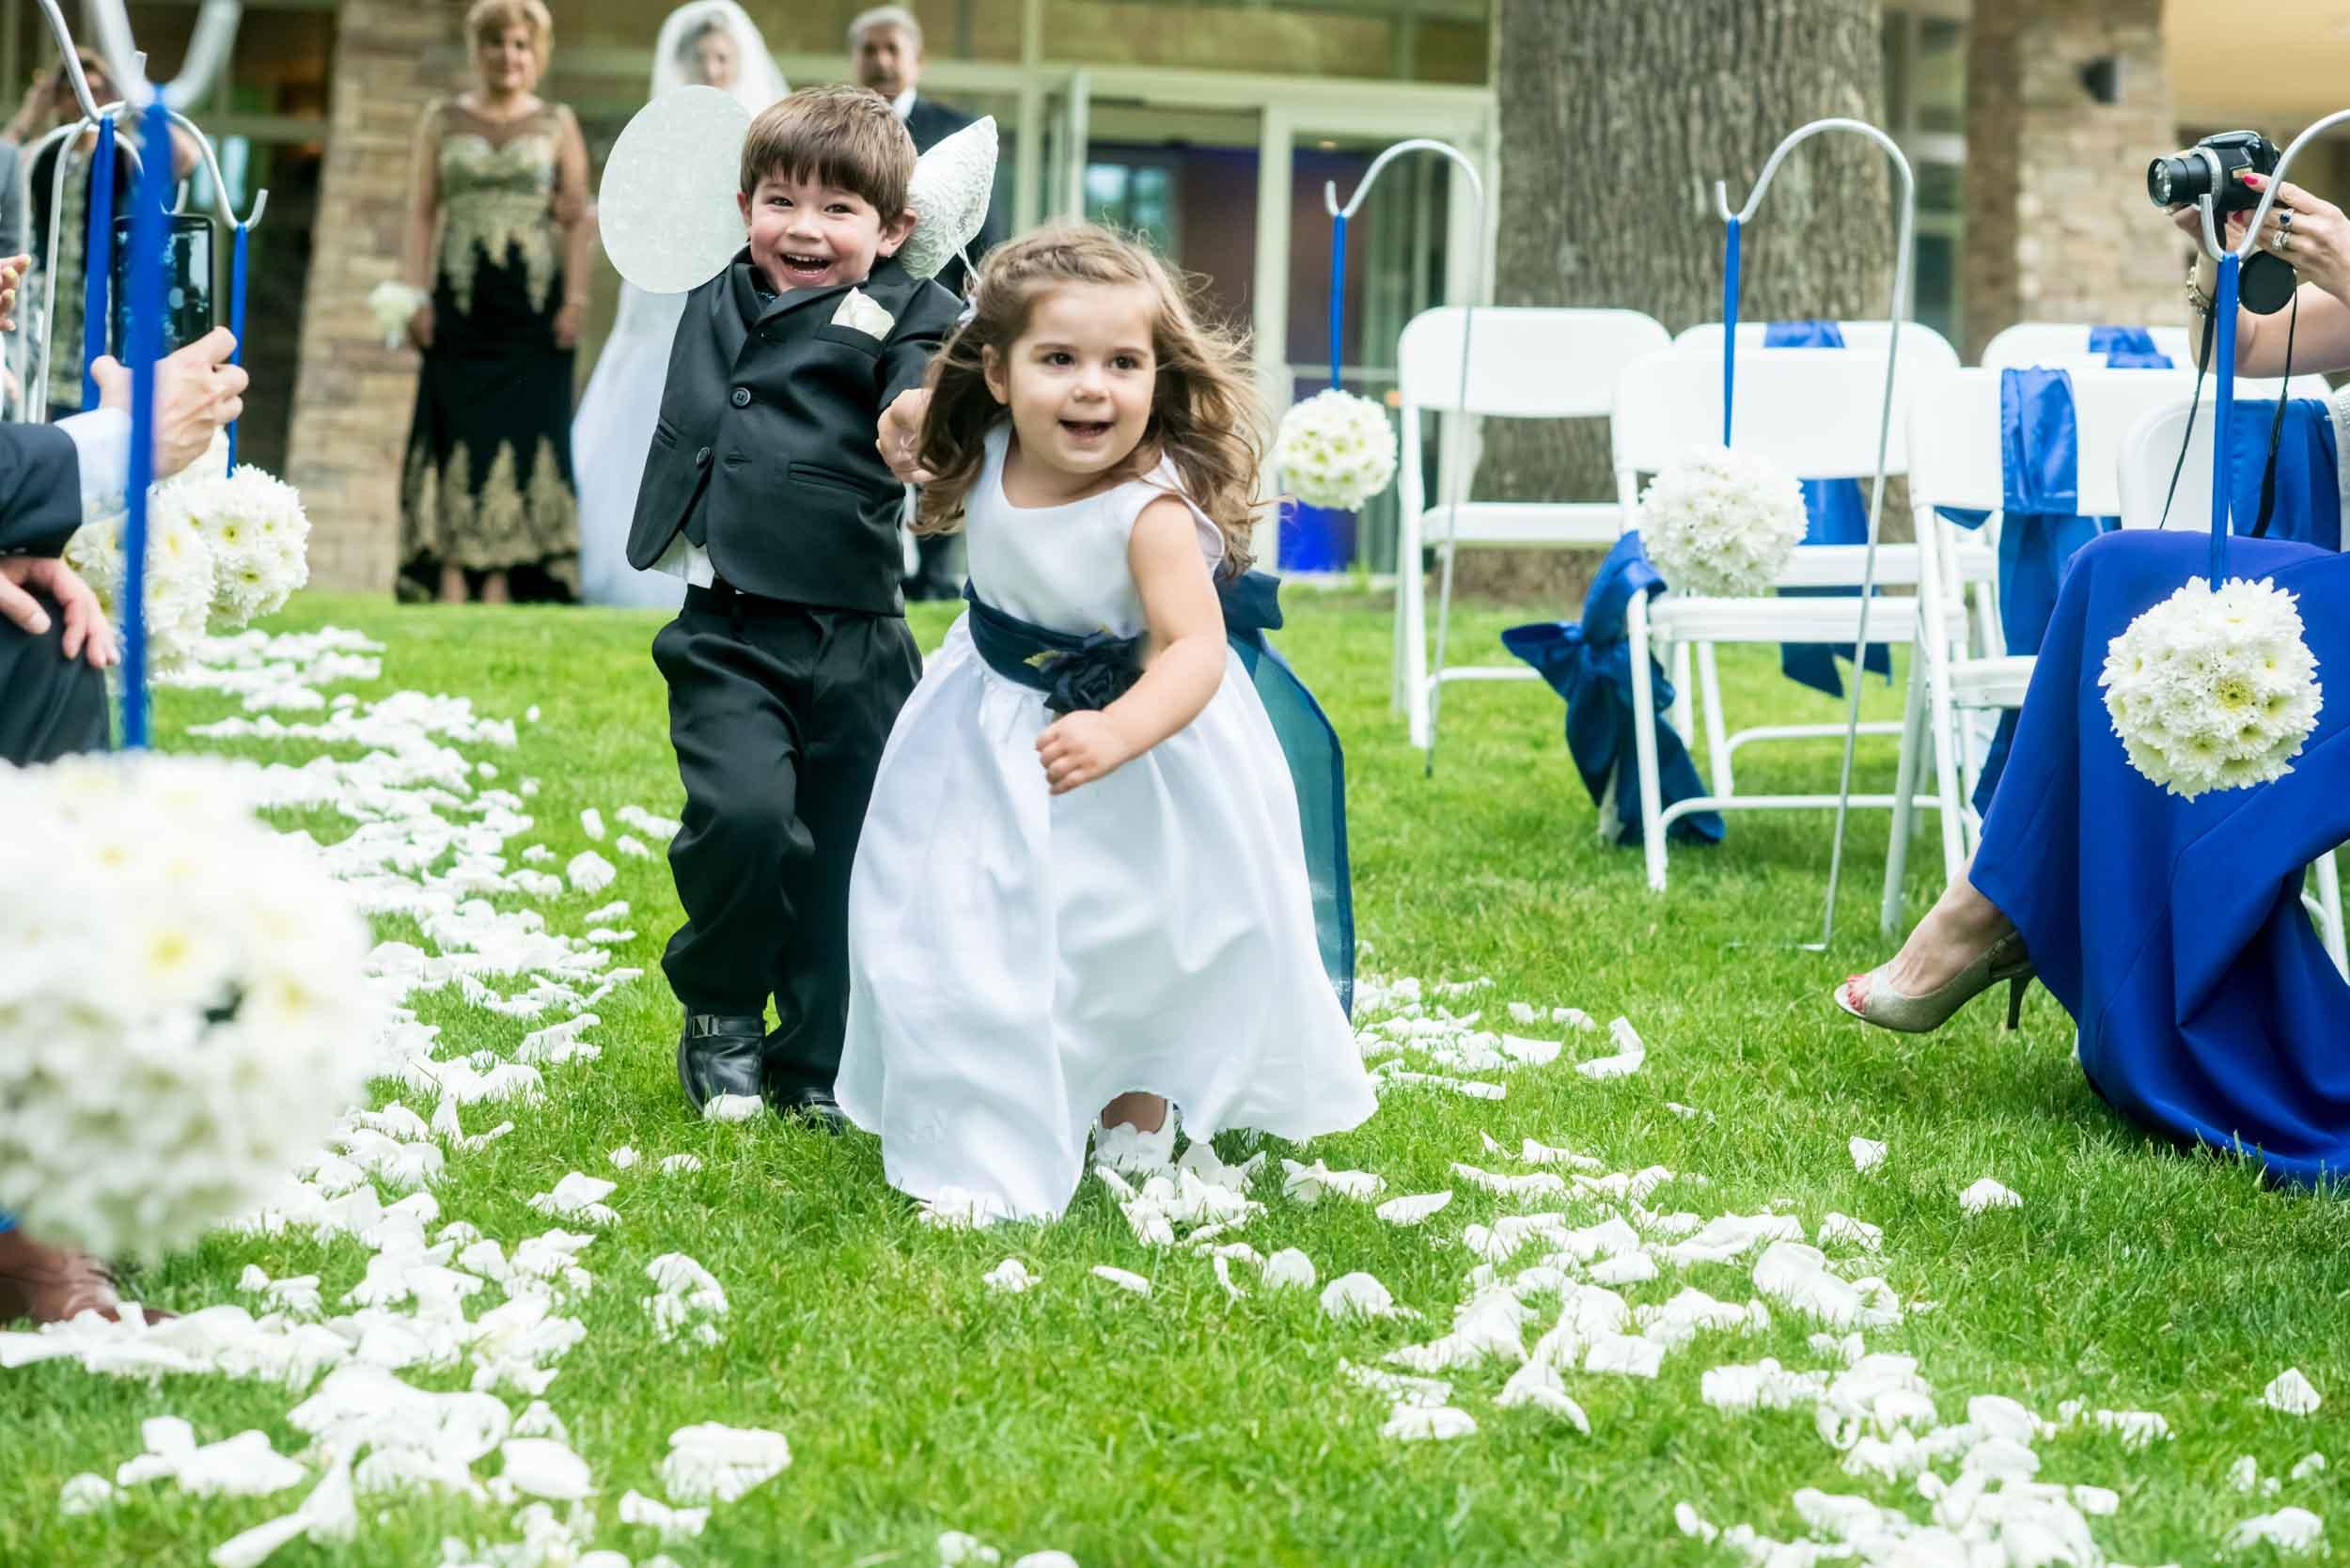 dc+metro+wedding+photographer+vadym+guliuk+photography+wedding+ceremony-2033.jpg